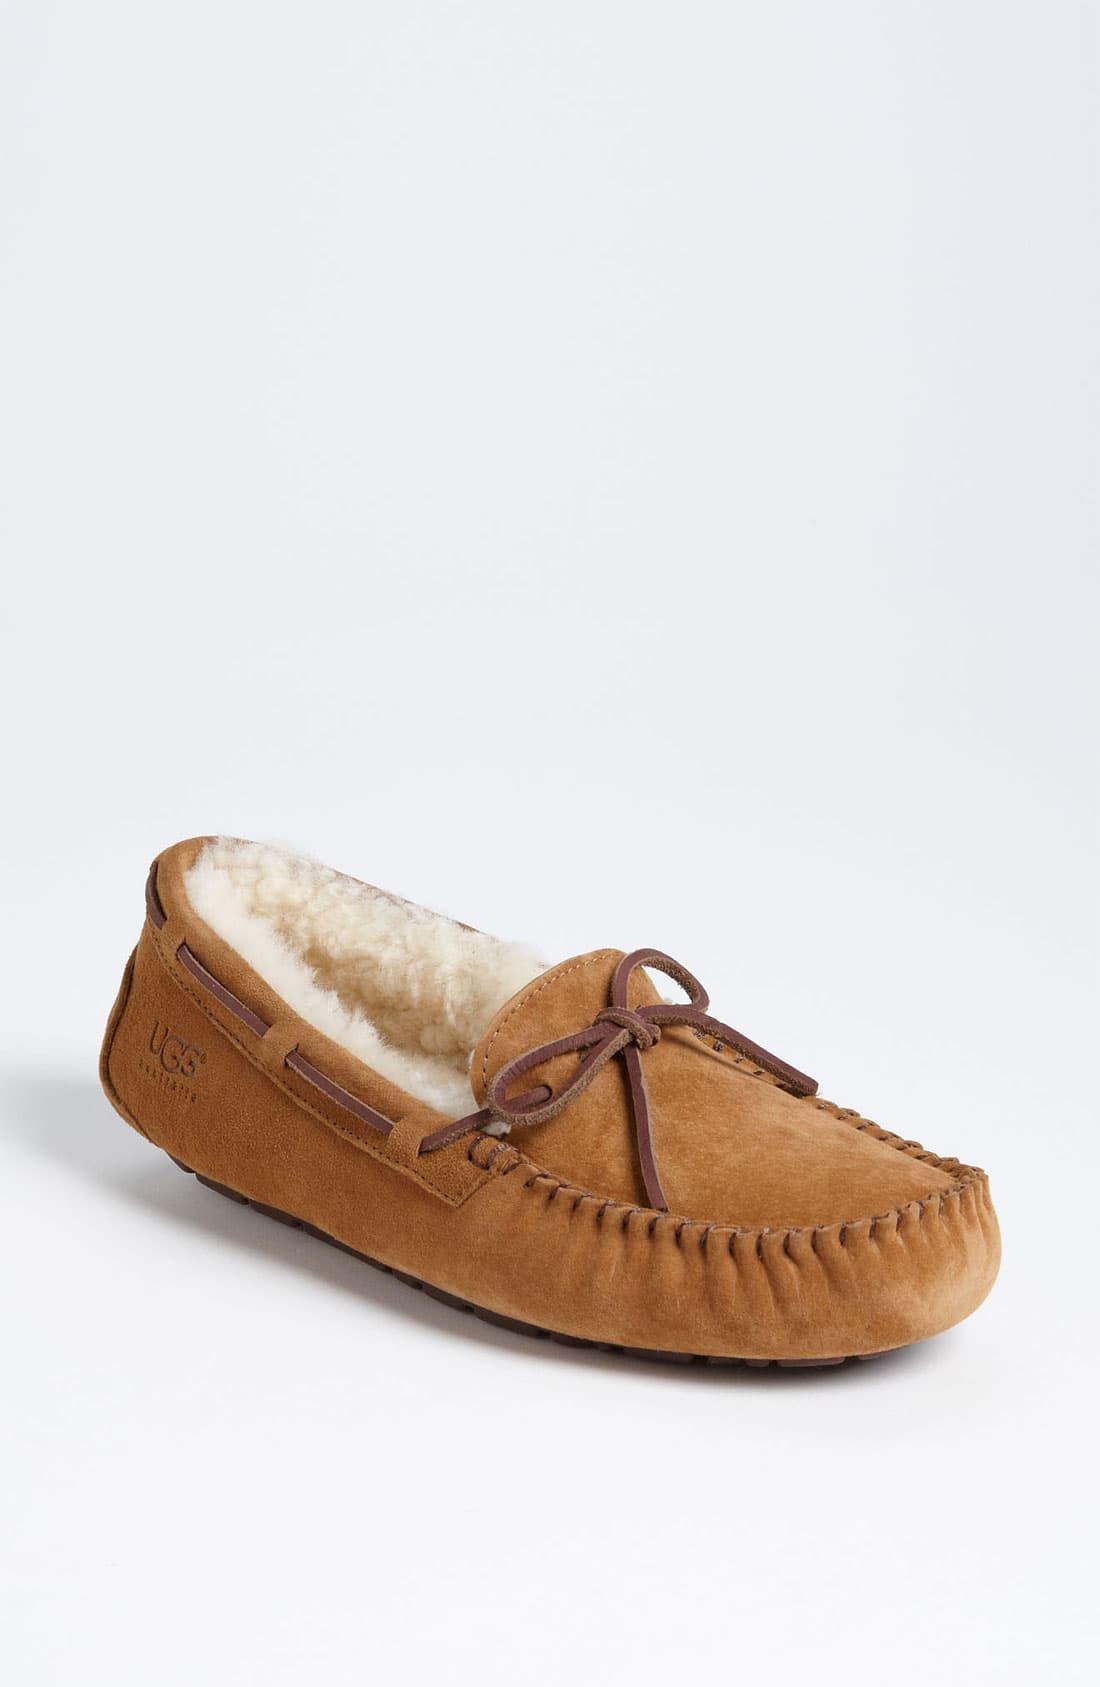 Ugg dakota slippers, Uggs